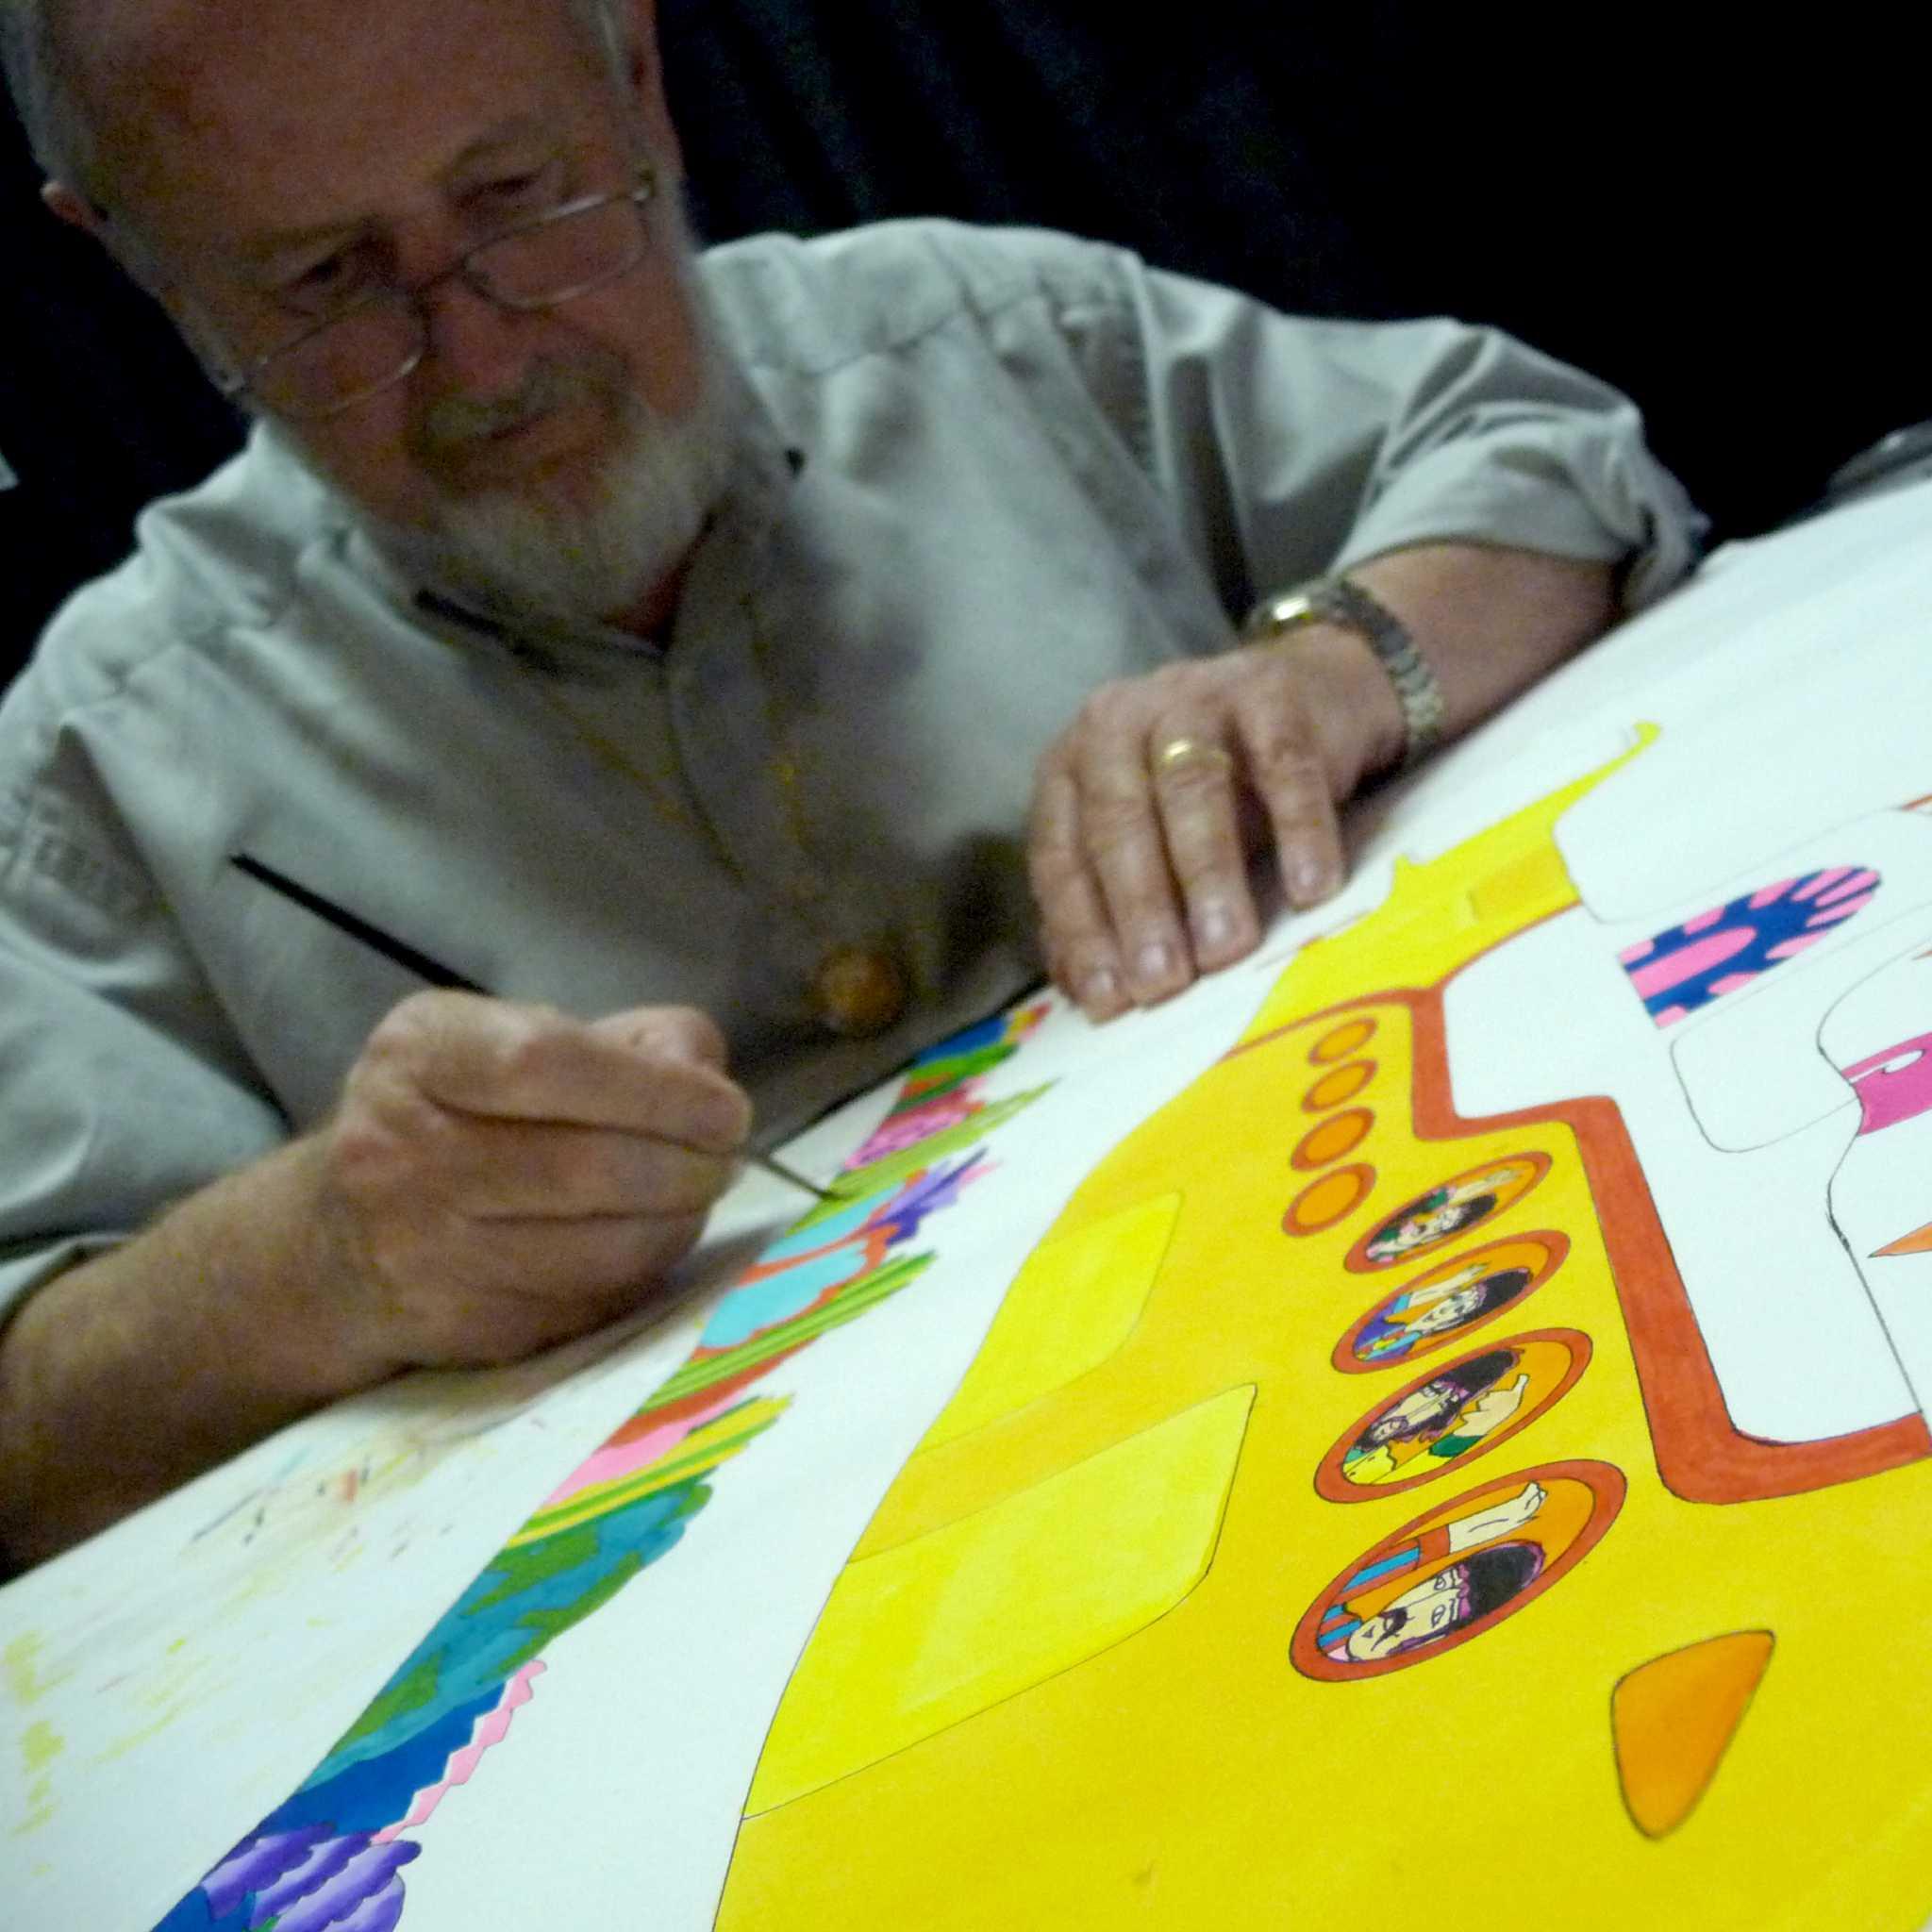 Beatles Cartoon Animator Among Star Attractions At Kzep